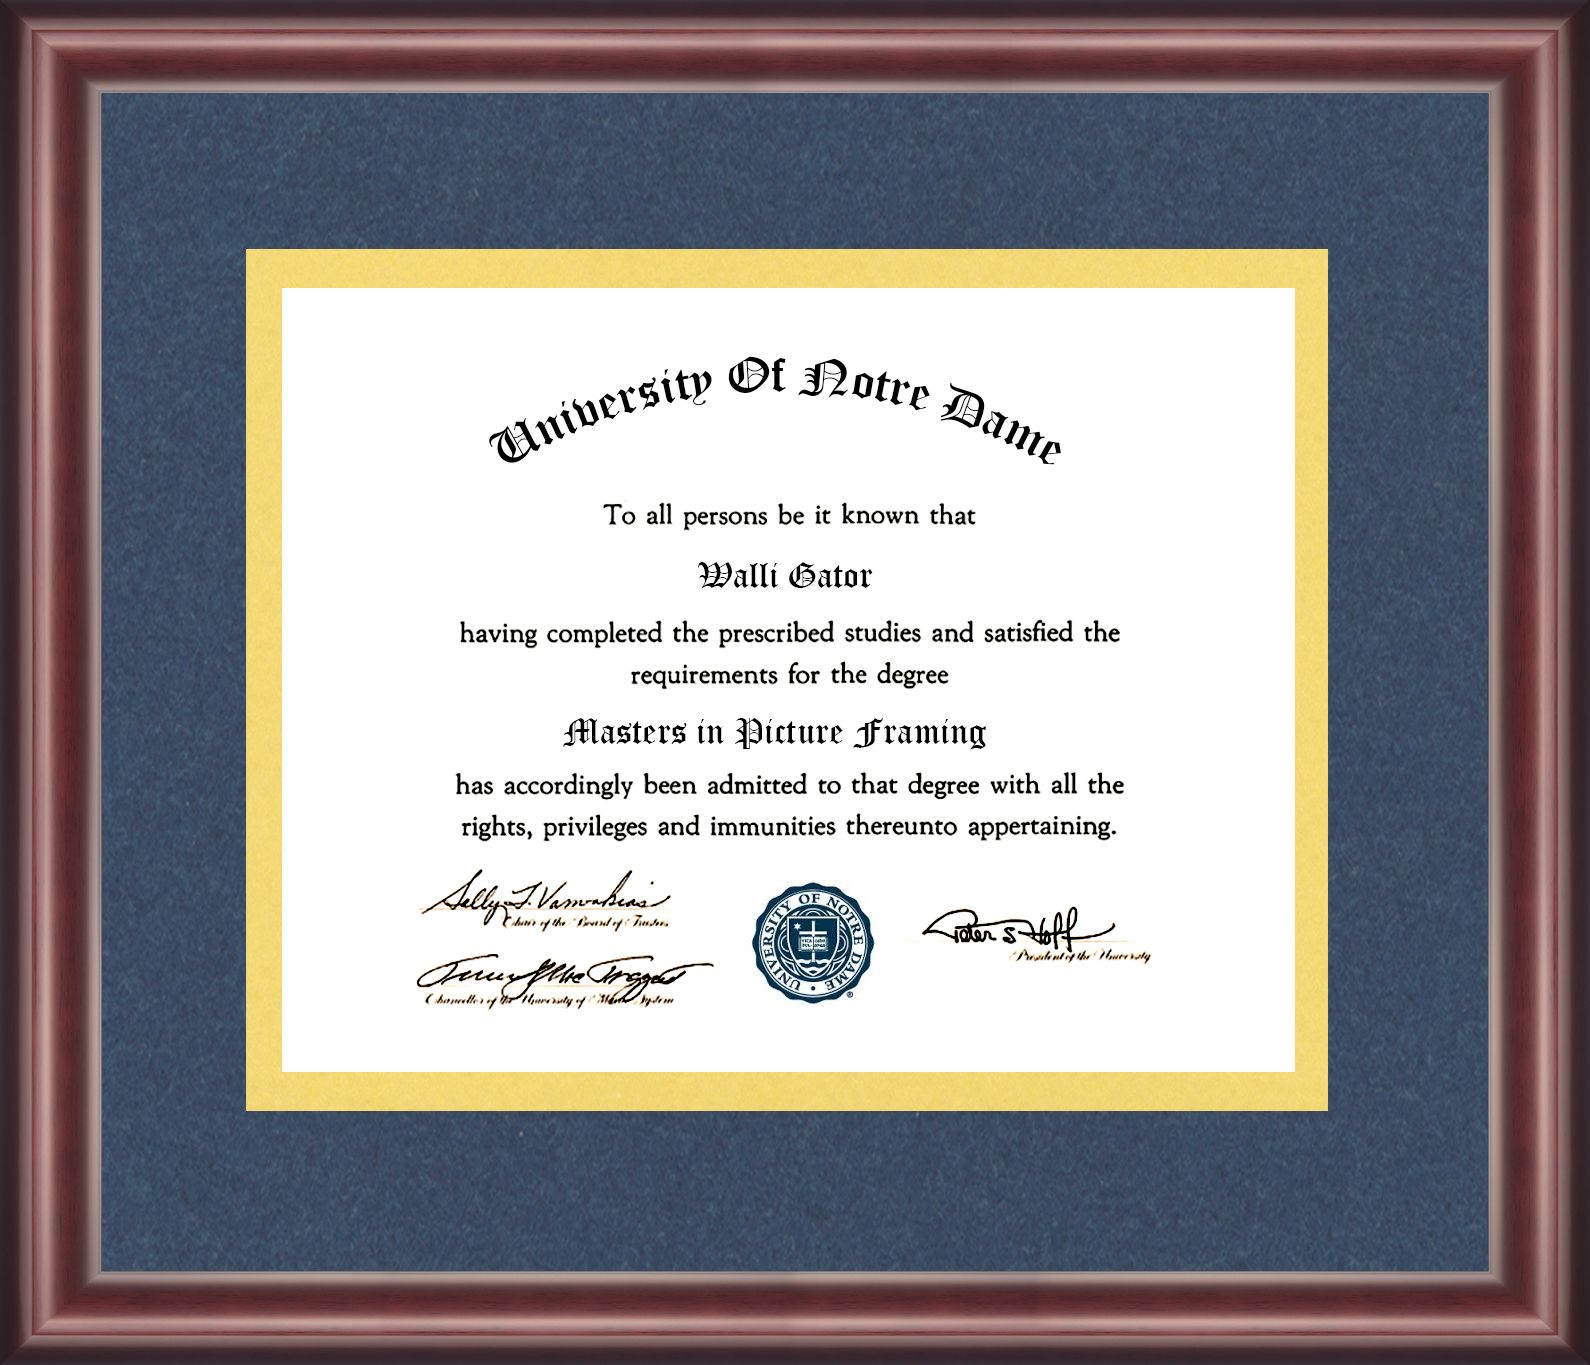 University of Notre Dame Diploma Frame | Pinterest | University ...